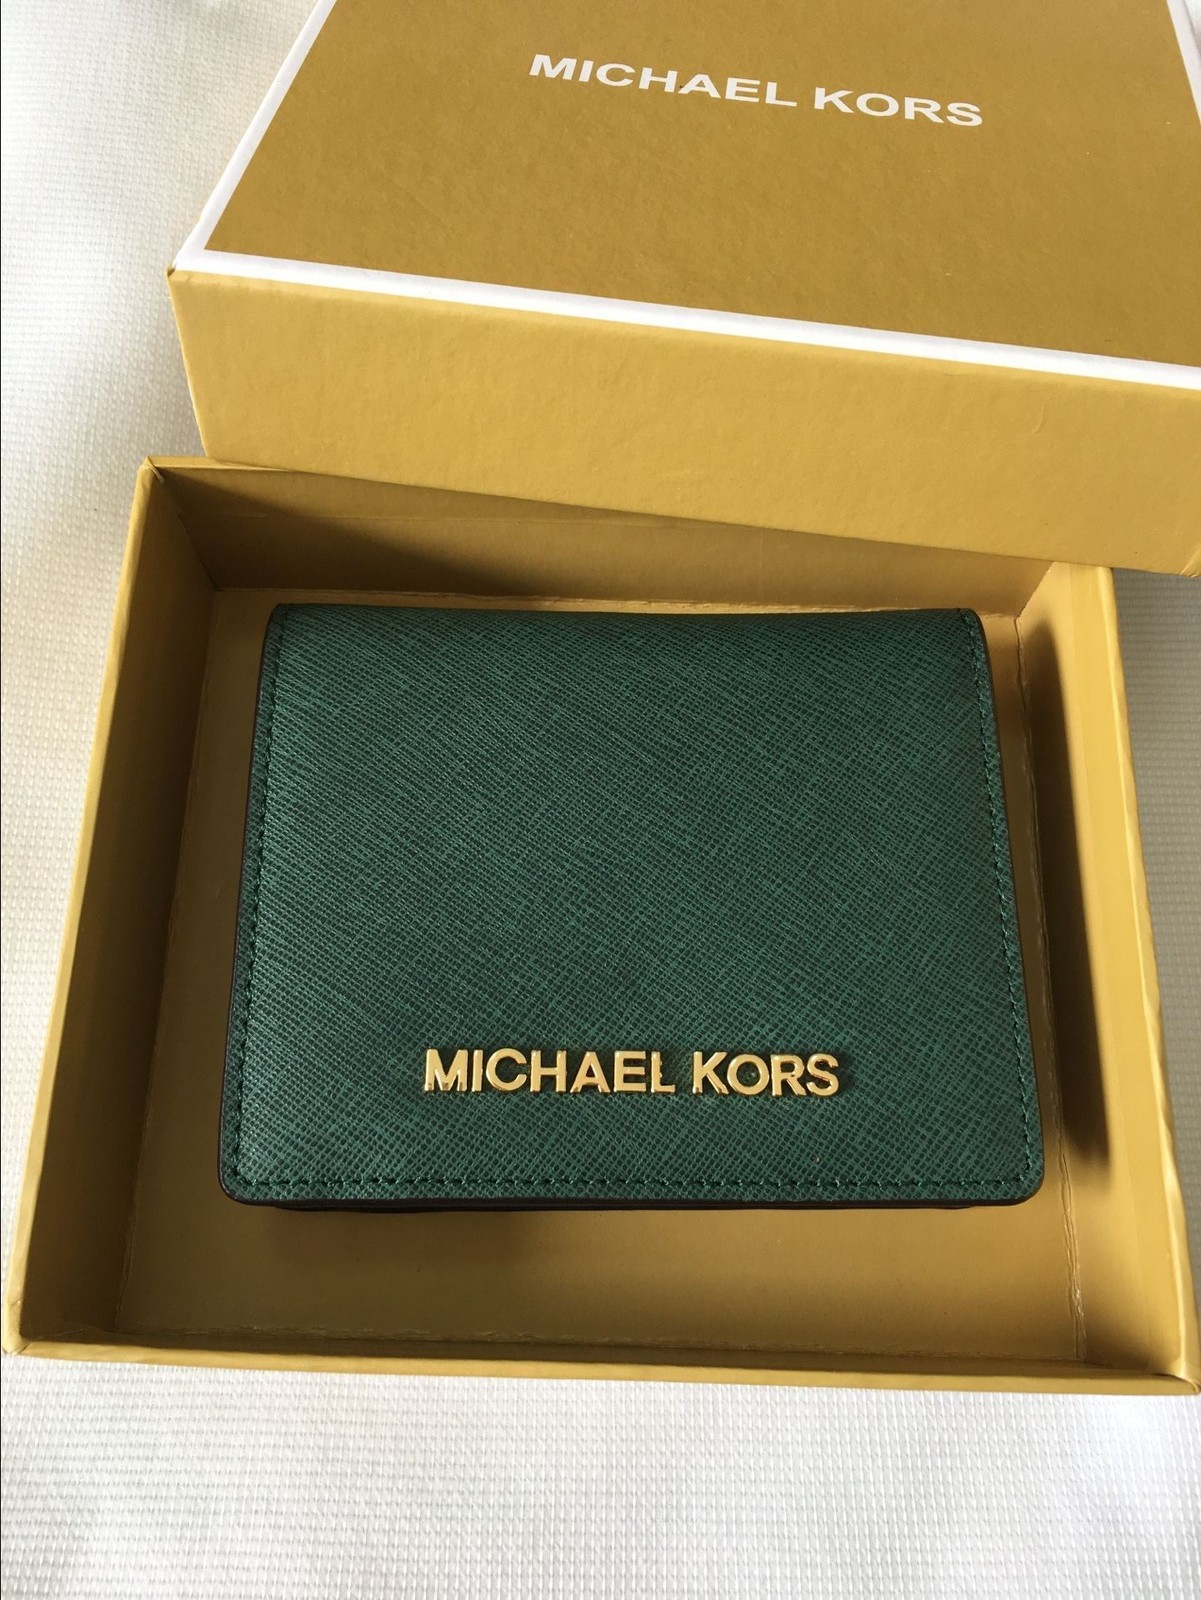 31fc5b52cacb Qq 20171102103216. Qq 20171102103216. Previous. Michael Kors Jet Set Travel  Flap Card Holder Wallet Moss Green Authentic